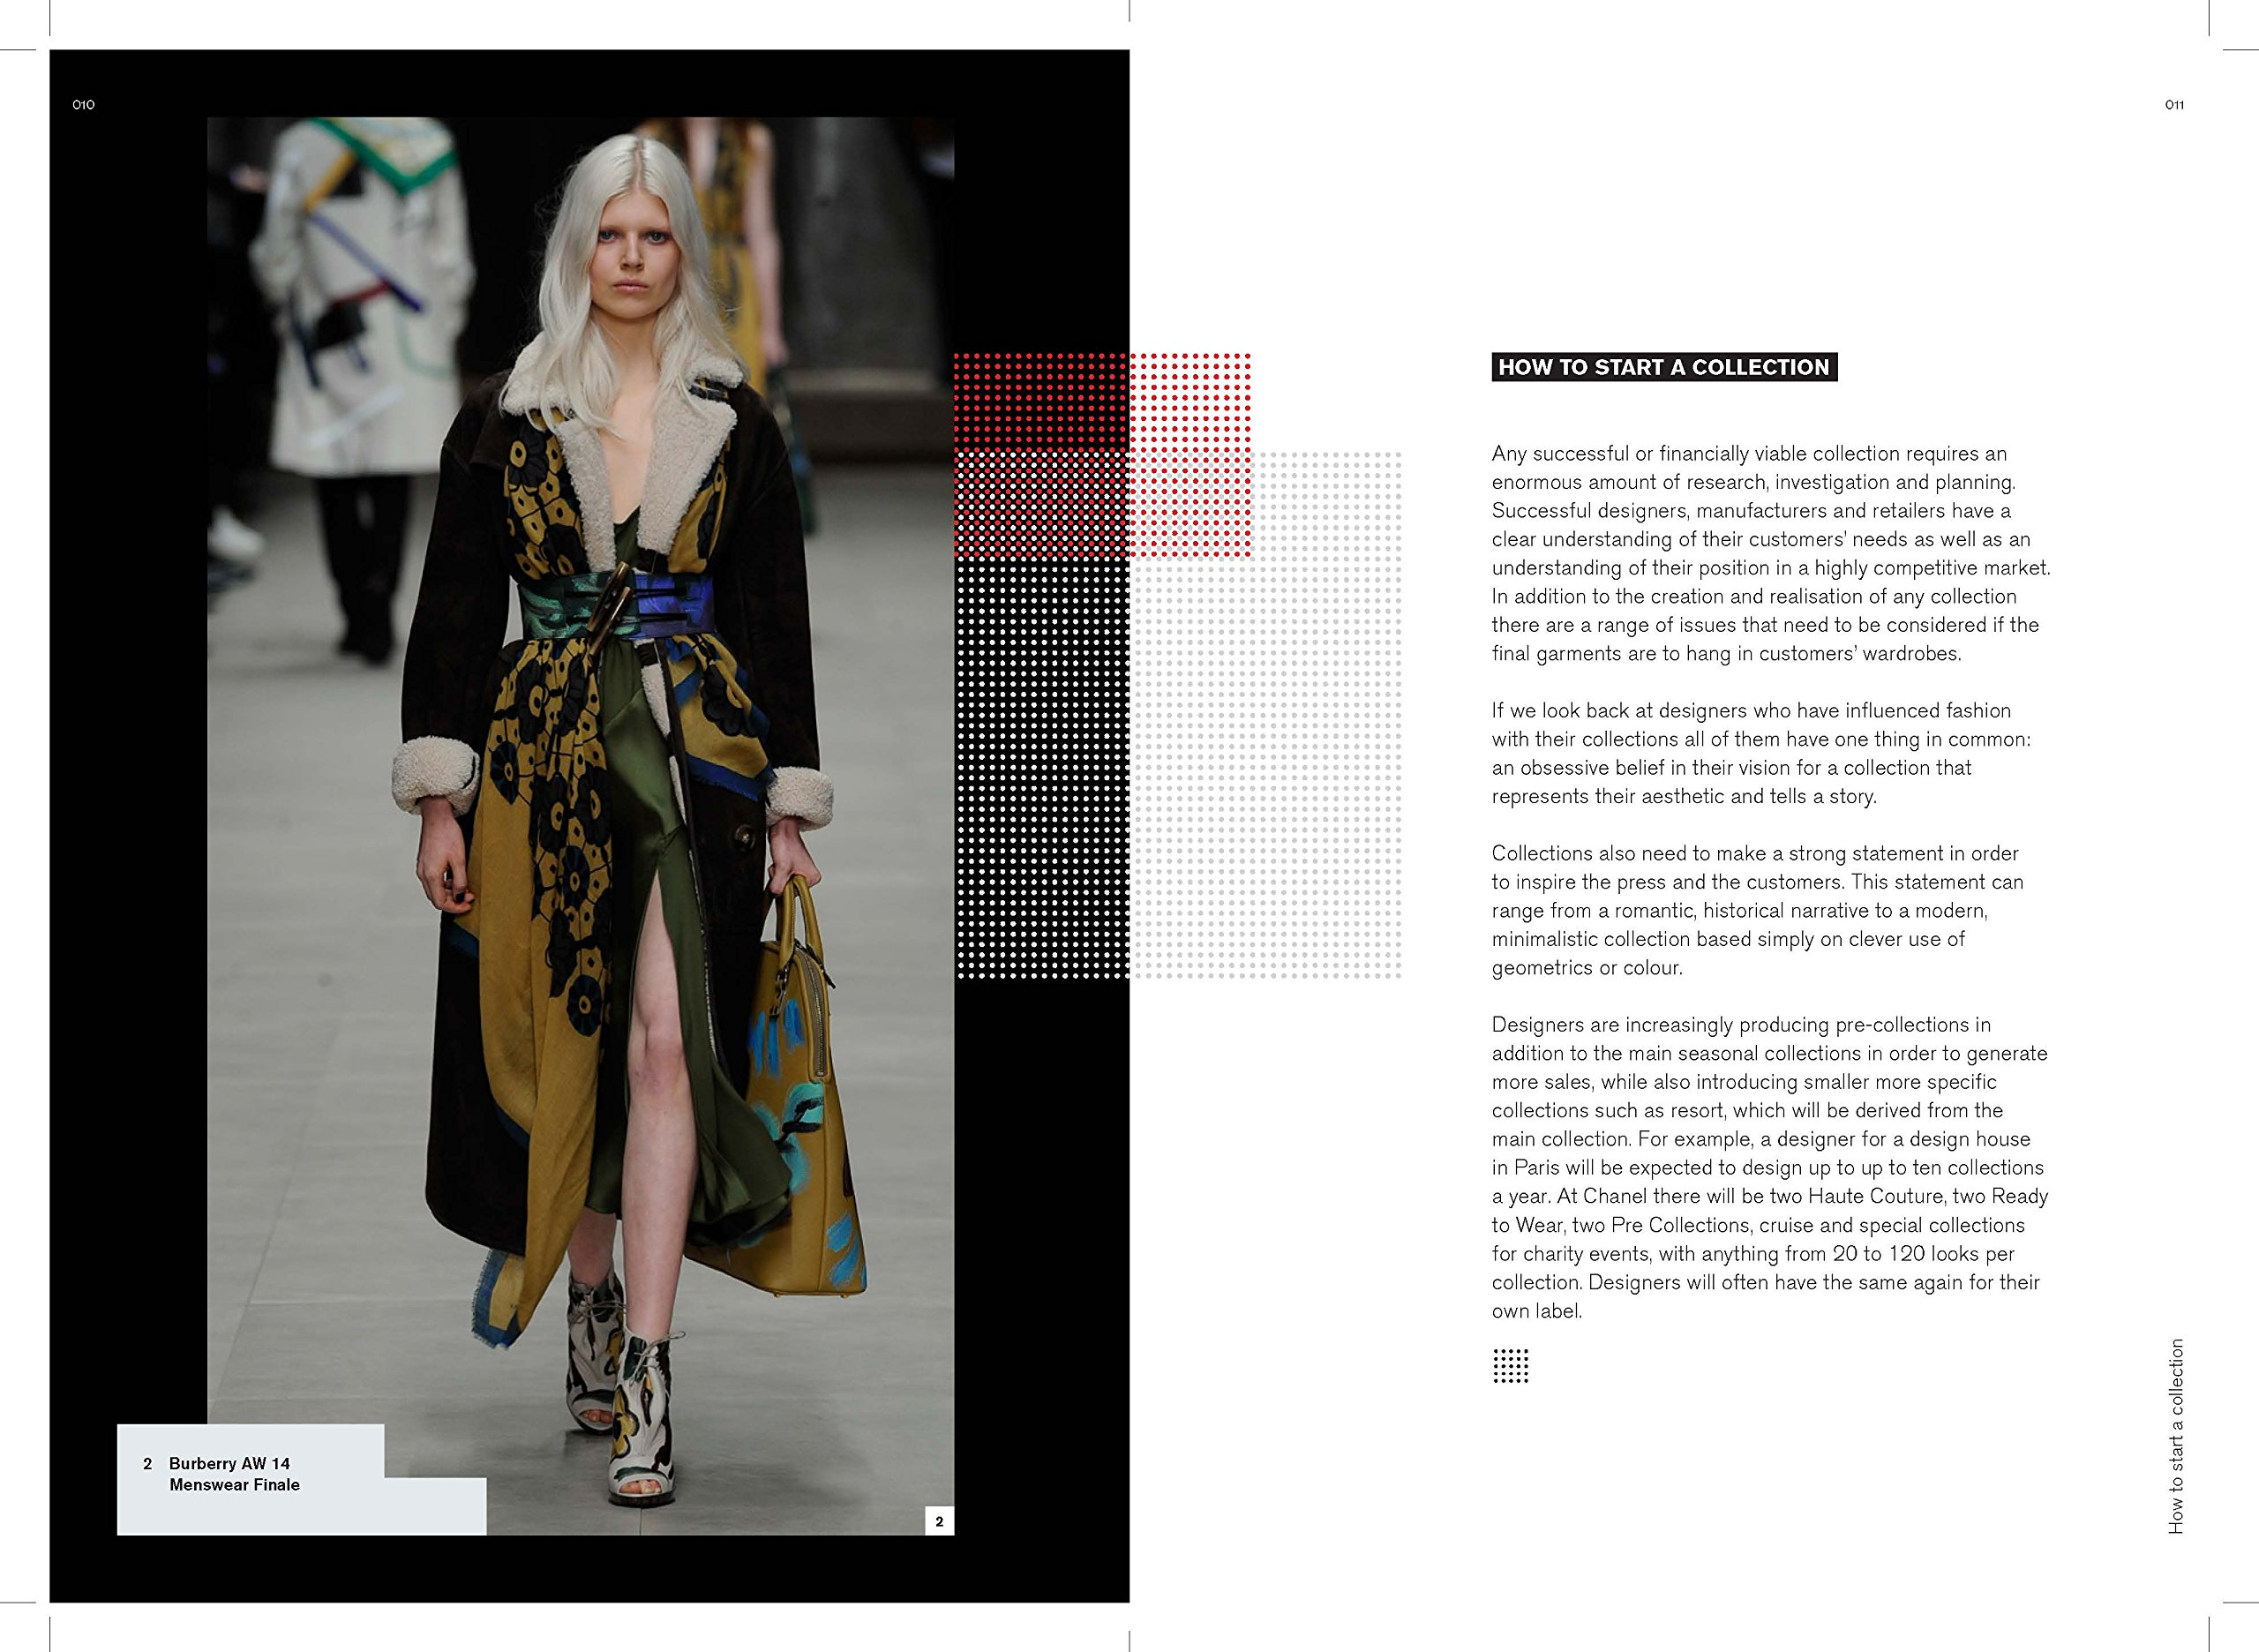 Developing A Fashion Collection Basics Fashion Design Renfrew Elinor Renfrew Colin 9782940496730 Amazon Com Books